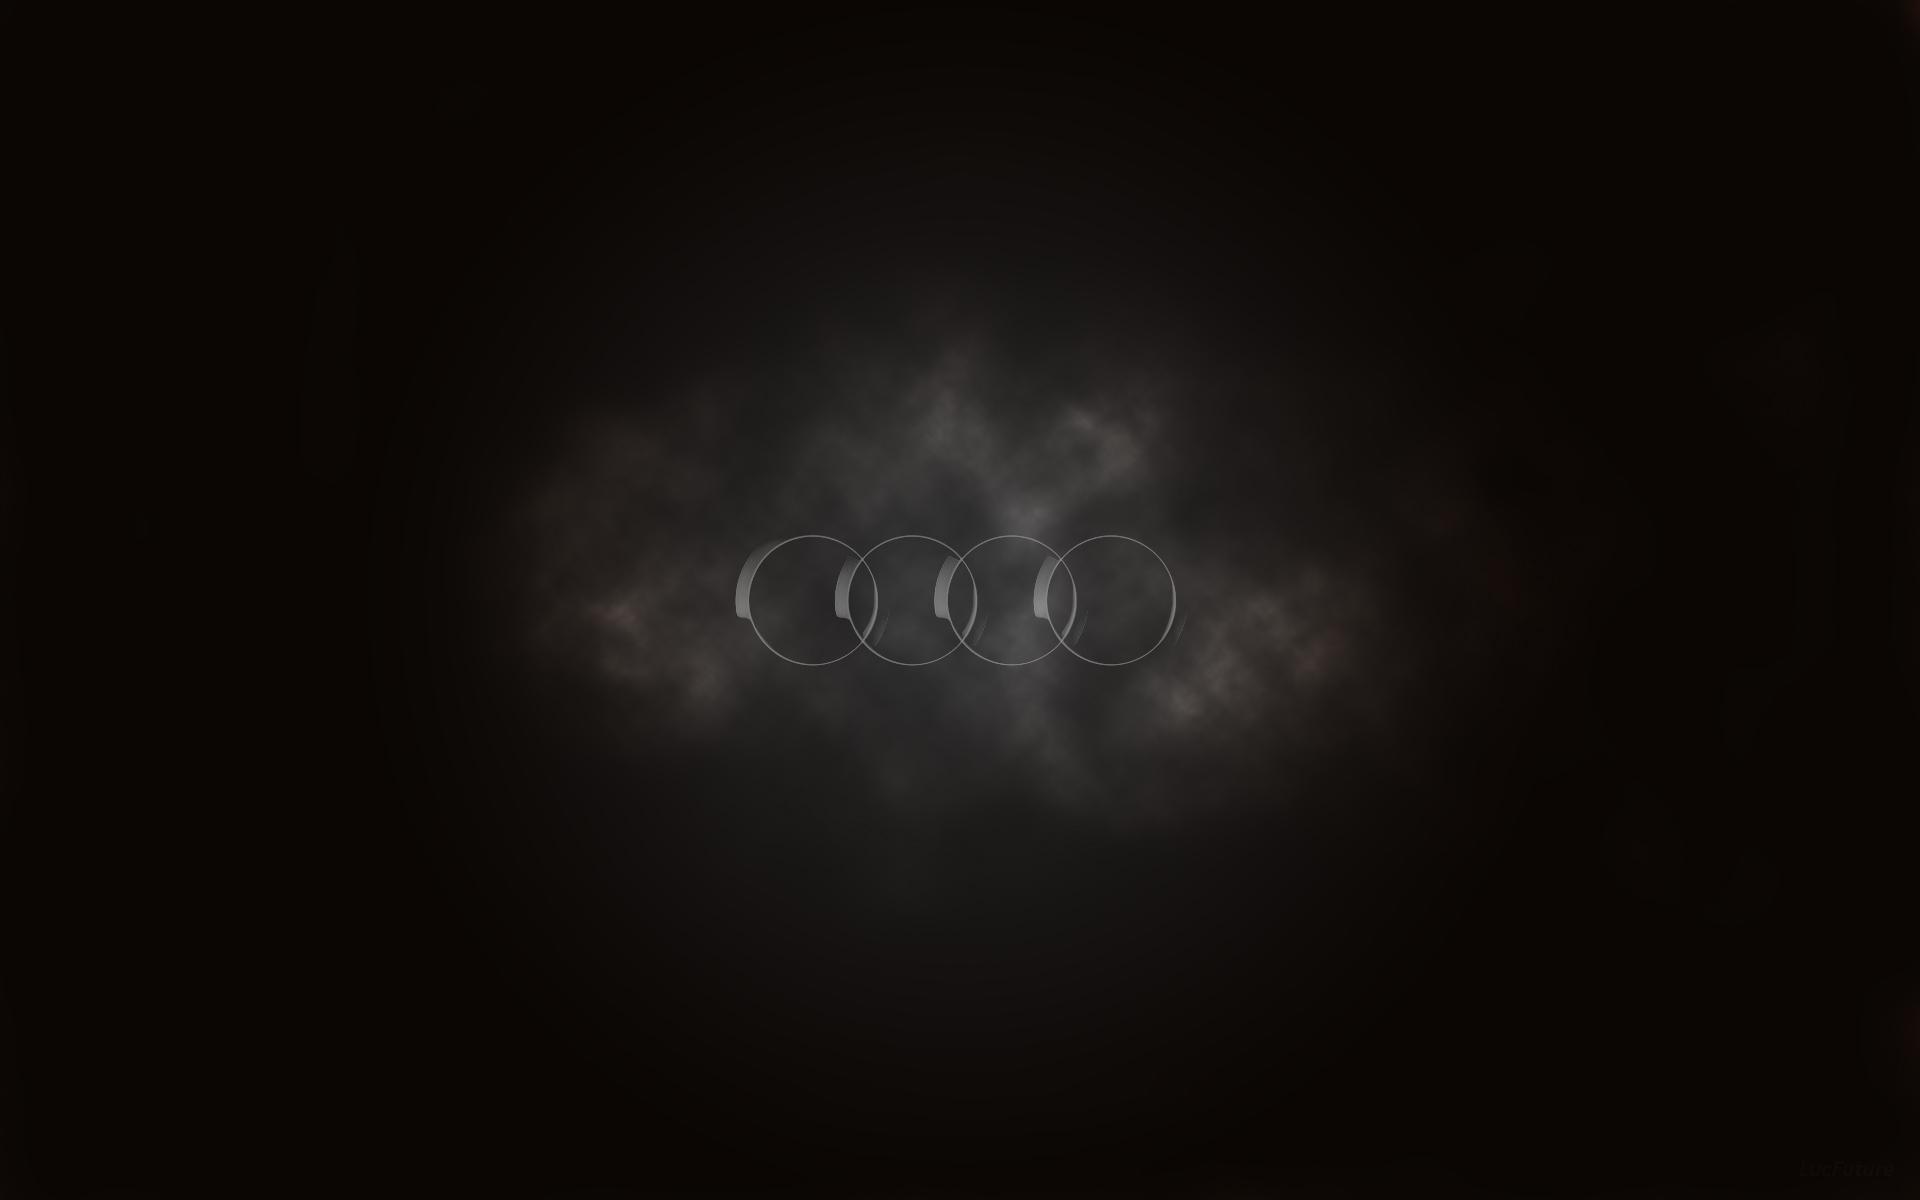 Audi Logo Wallpaper Download 5037 Wallpaper Cool Walldiskpaper 1920x1200